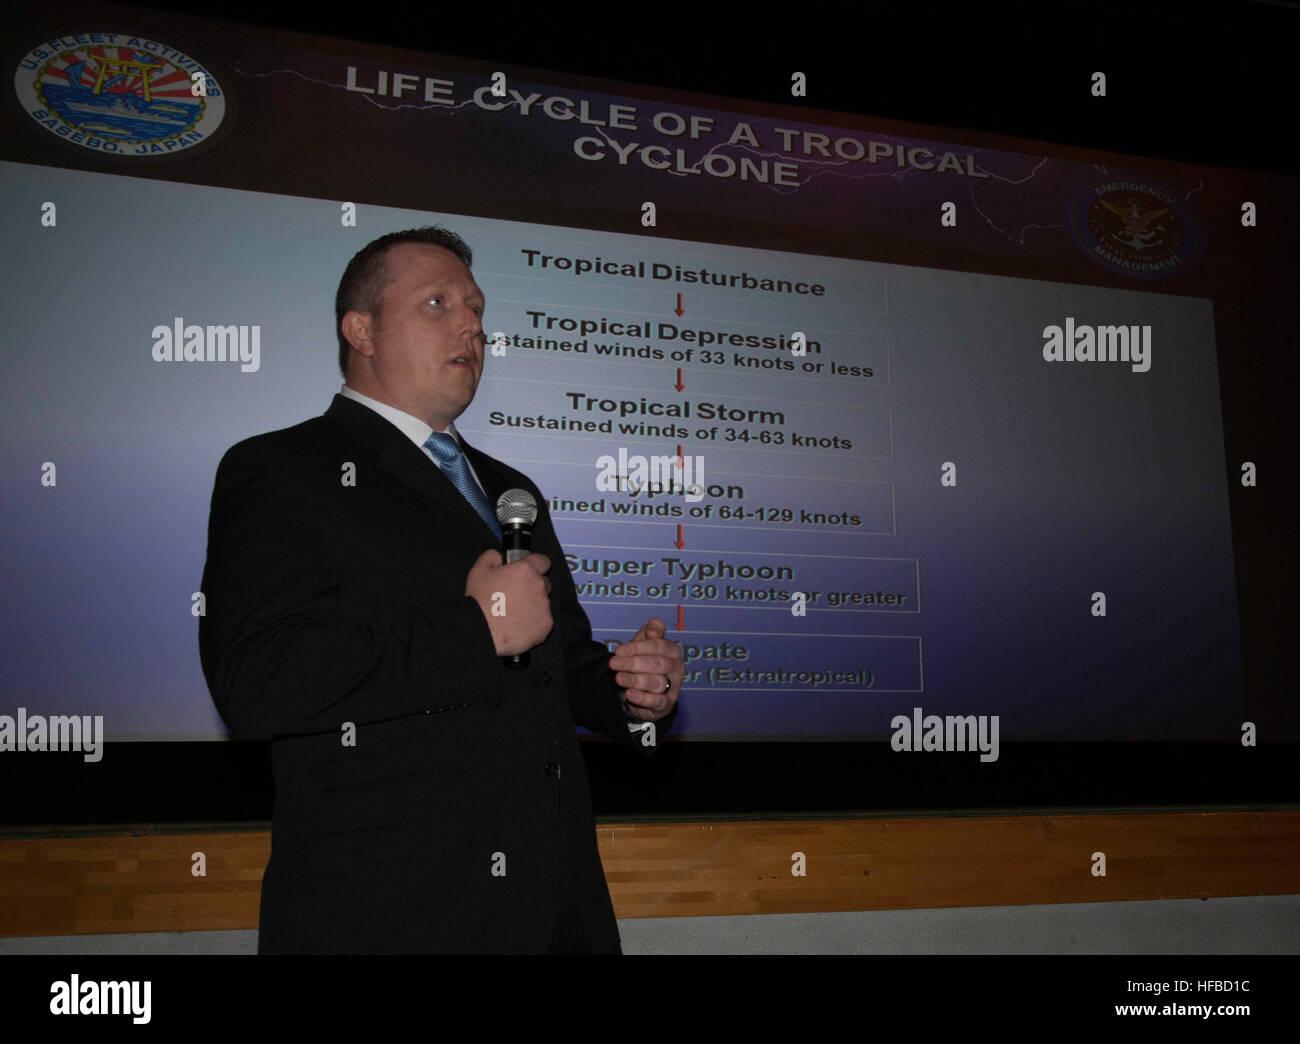 SASEBO, Japan (Apr. 18, 2016) David Johnston, Commander U.S. Fleet Activitives Sasebo emergency management officer, Stock Photo